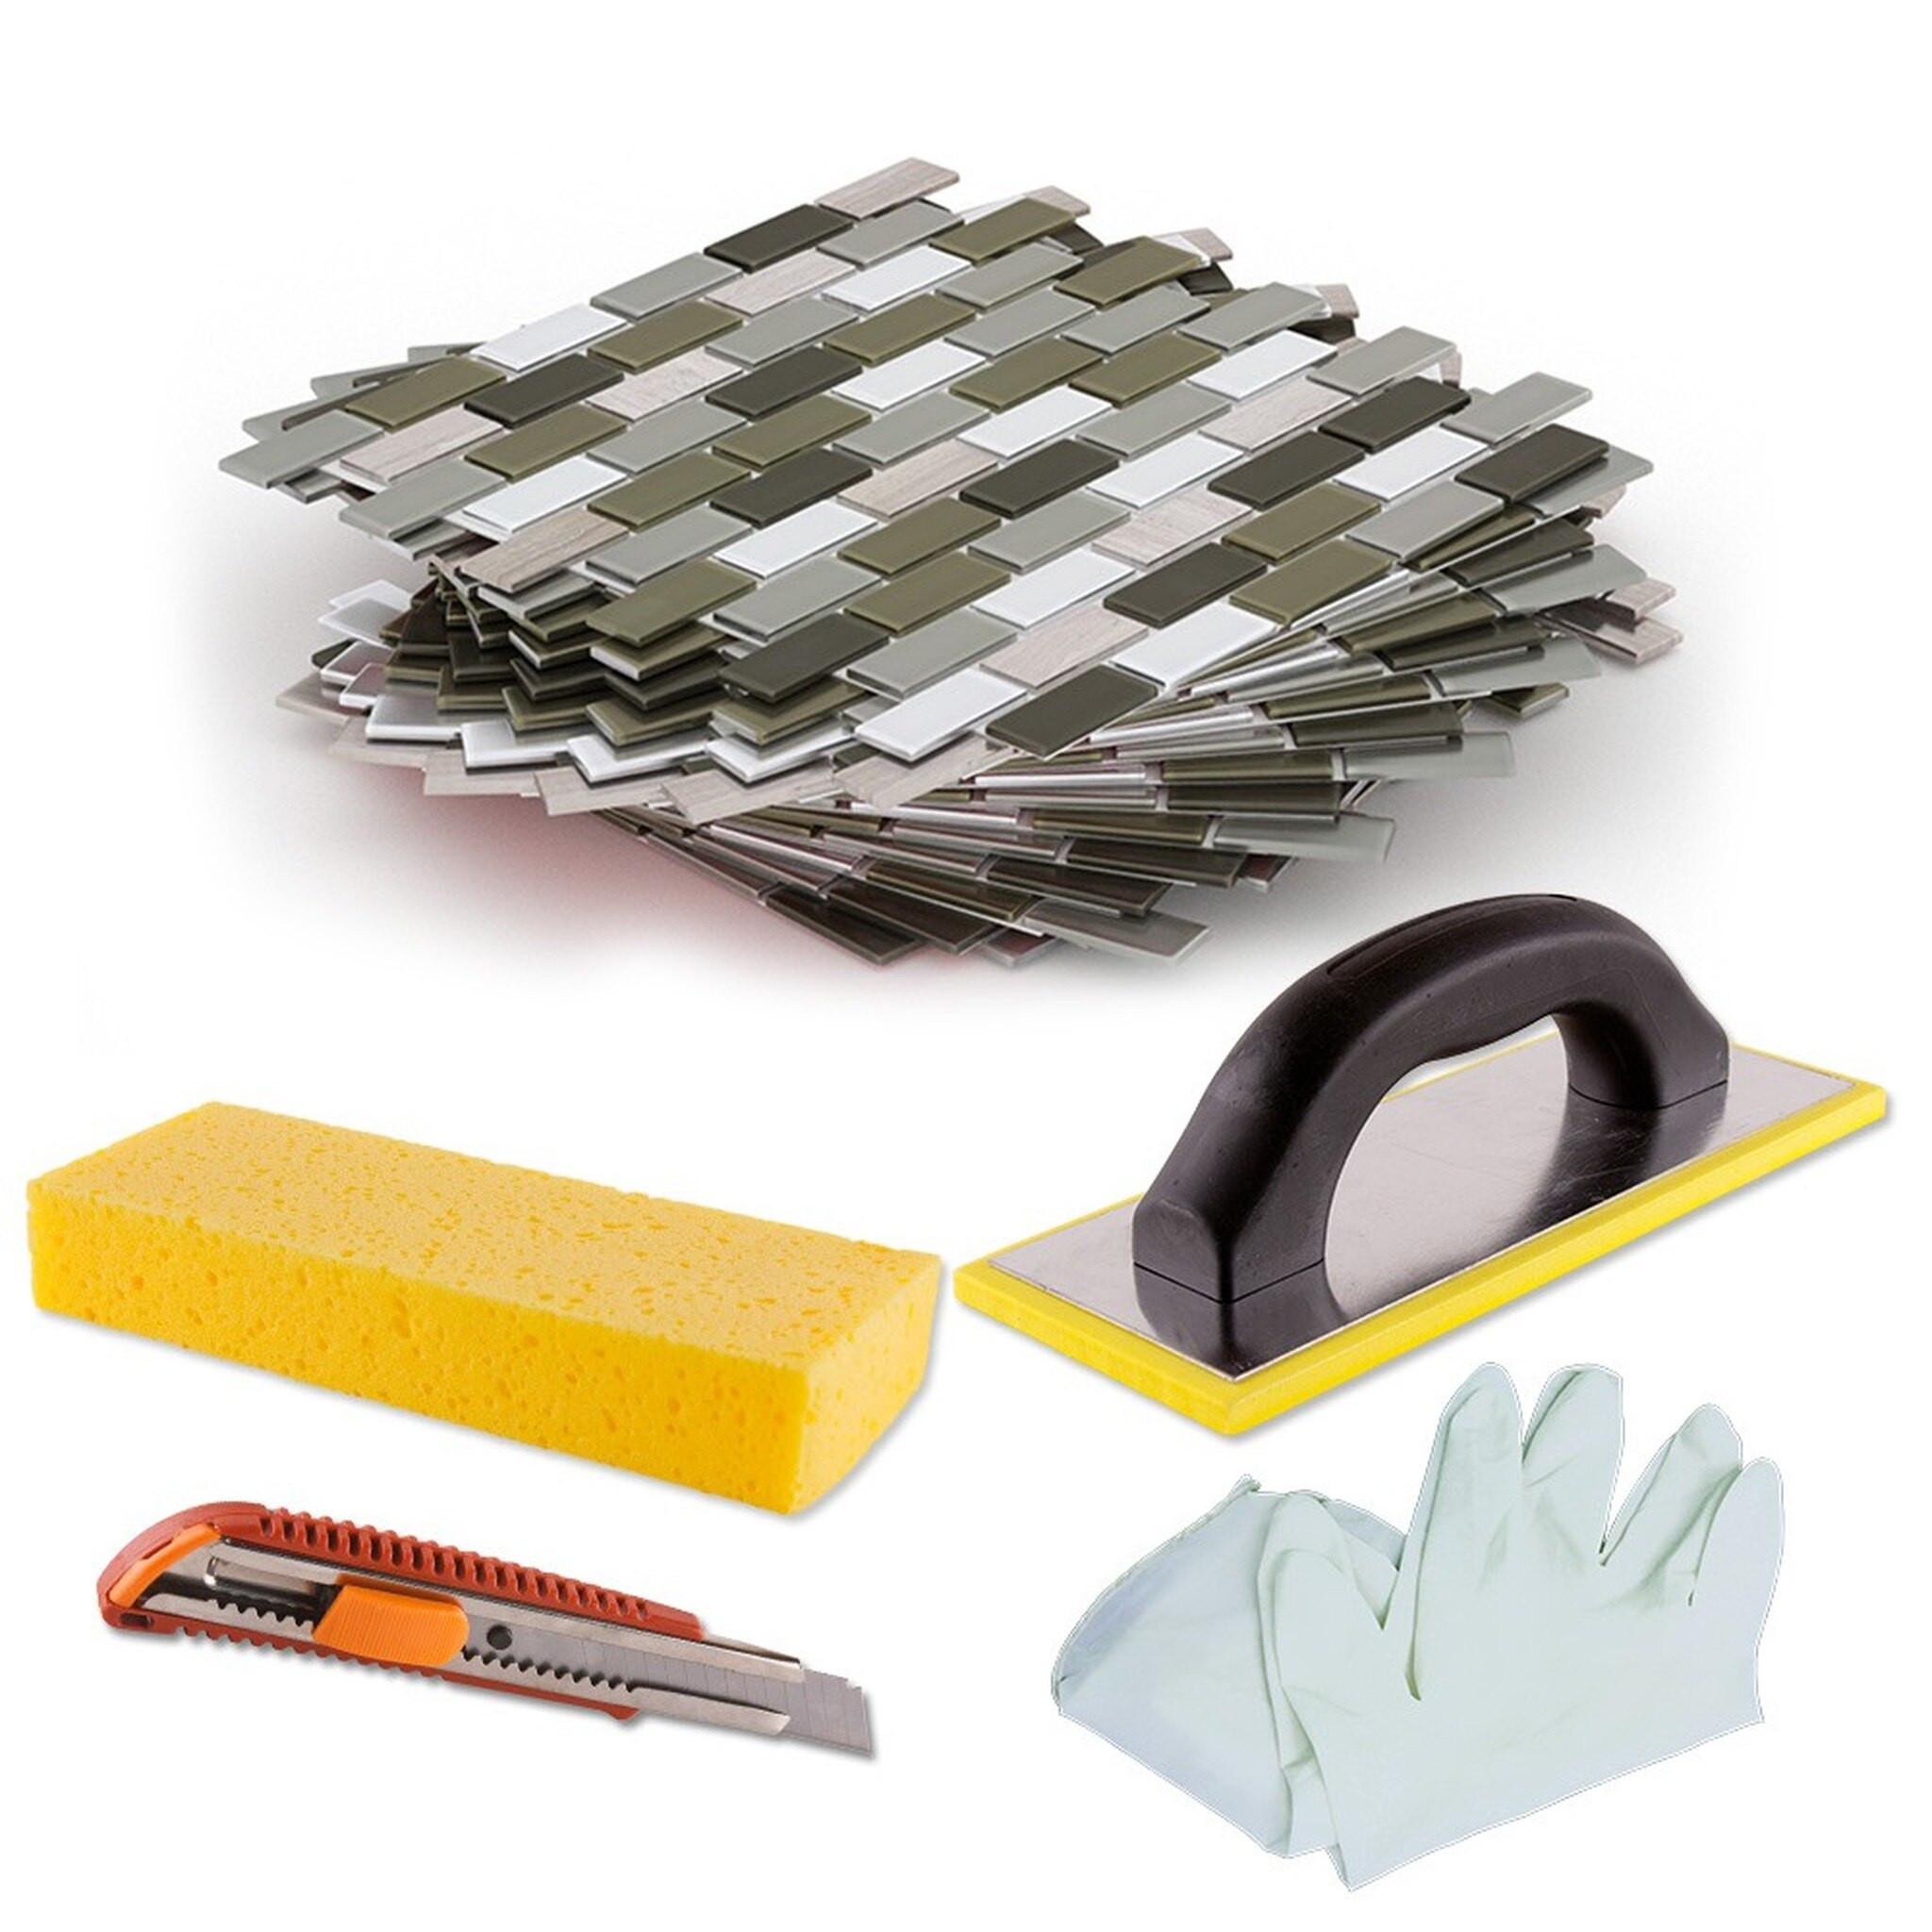 DIY Backsplash Kits  DIY Tile Backsplash Kit 15Ft Portofino